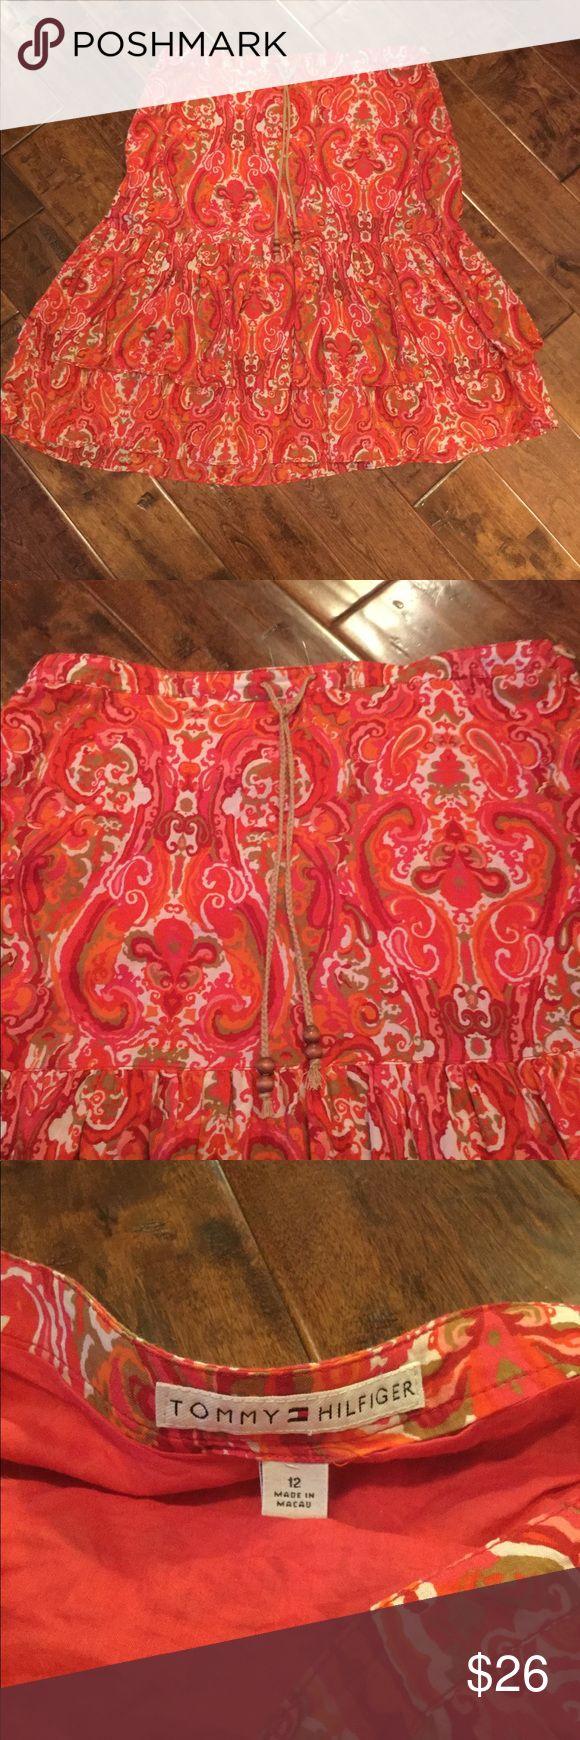 Tommy Hilfiger skirt Adorable full a-line skirt. Tommy Hilfiger Skirts A-Line or Full